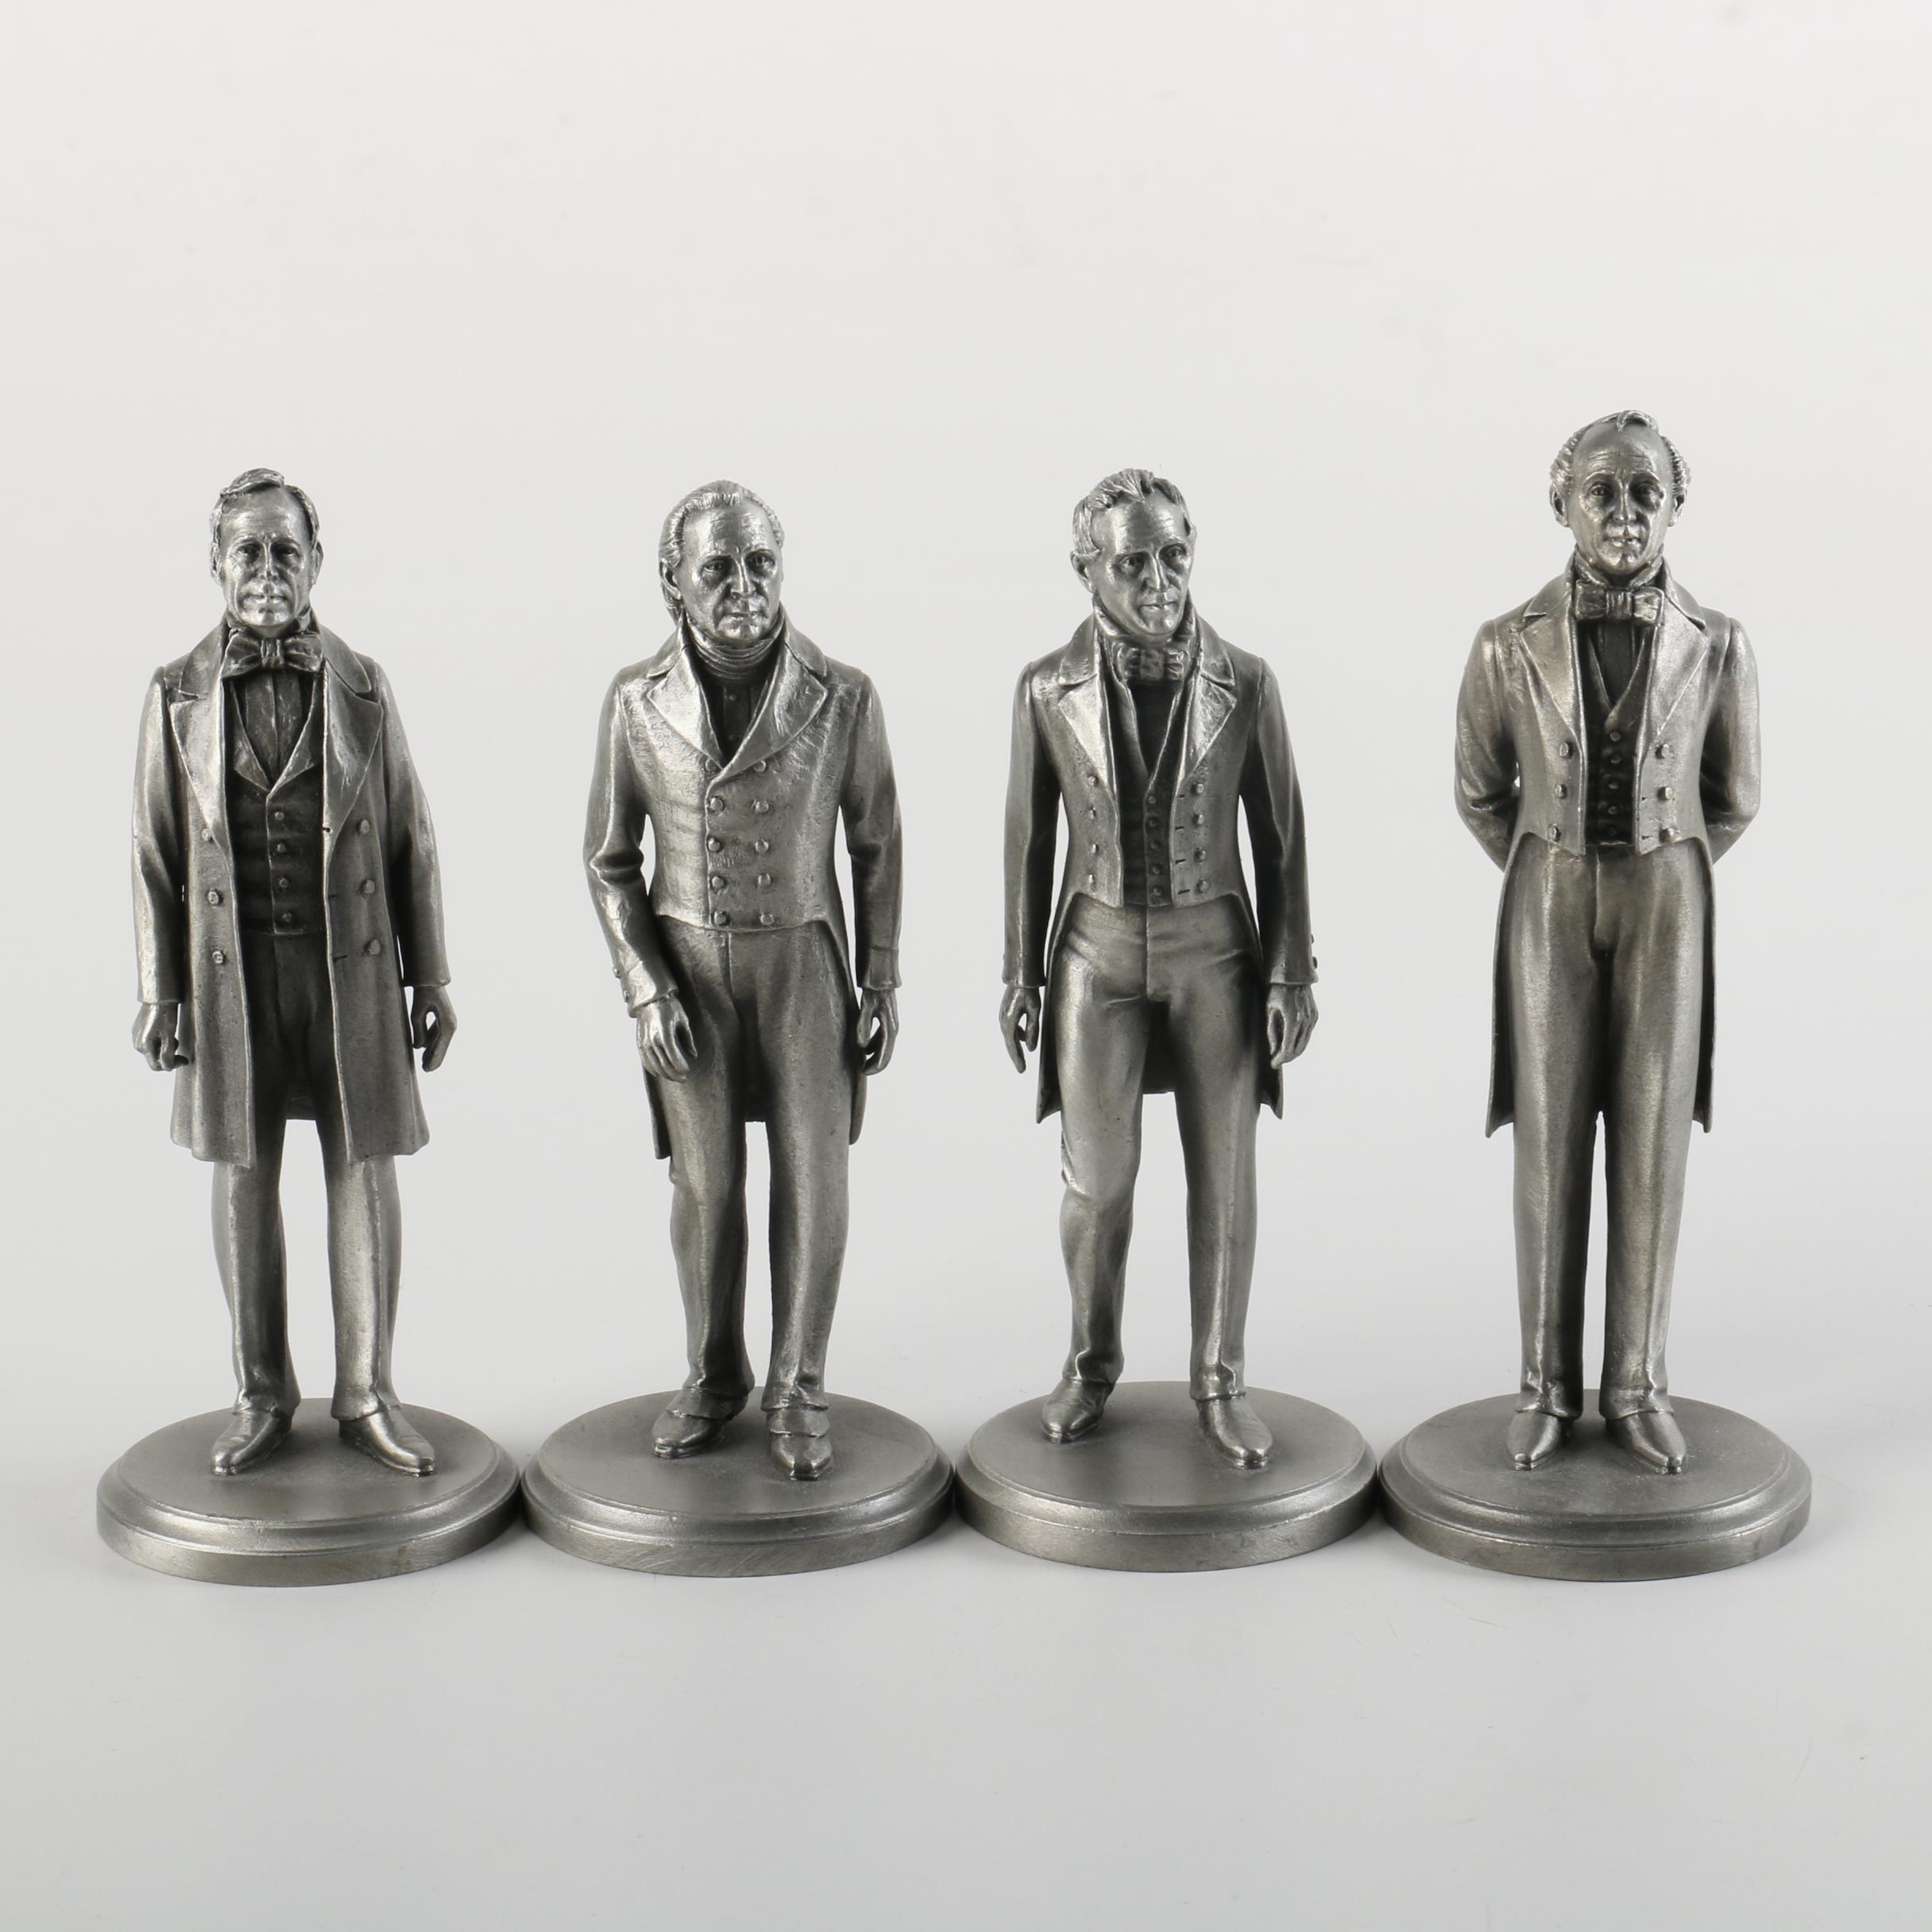 Vintage Lance Pewter American President Figurines